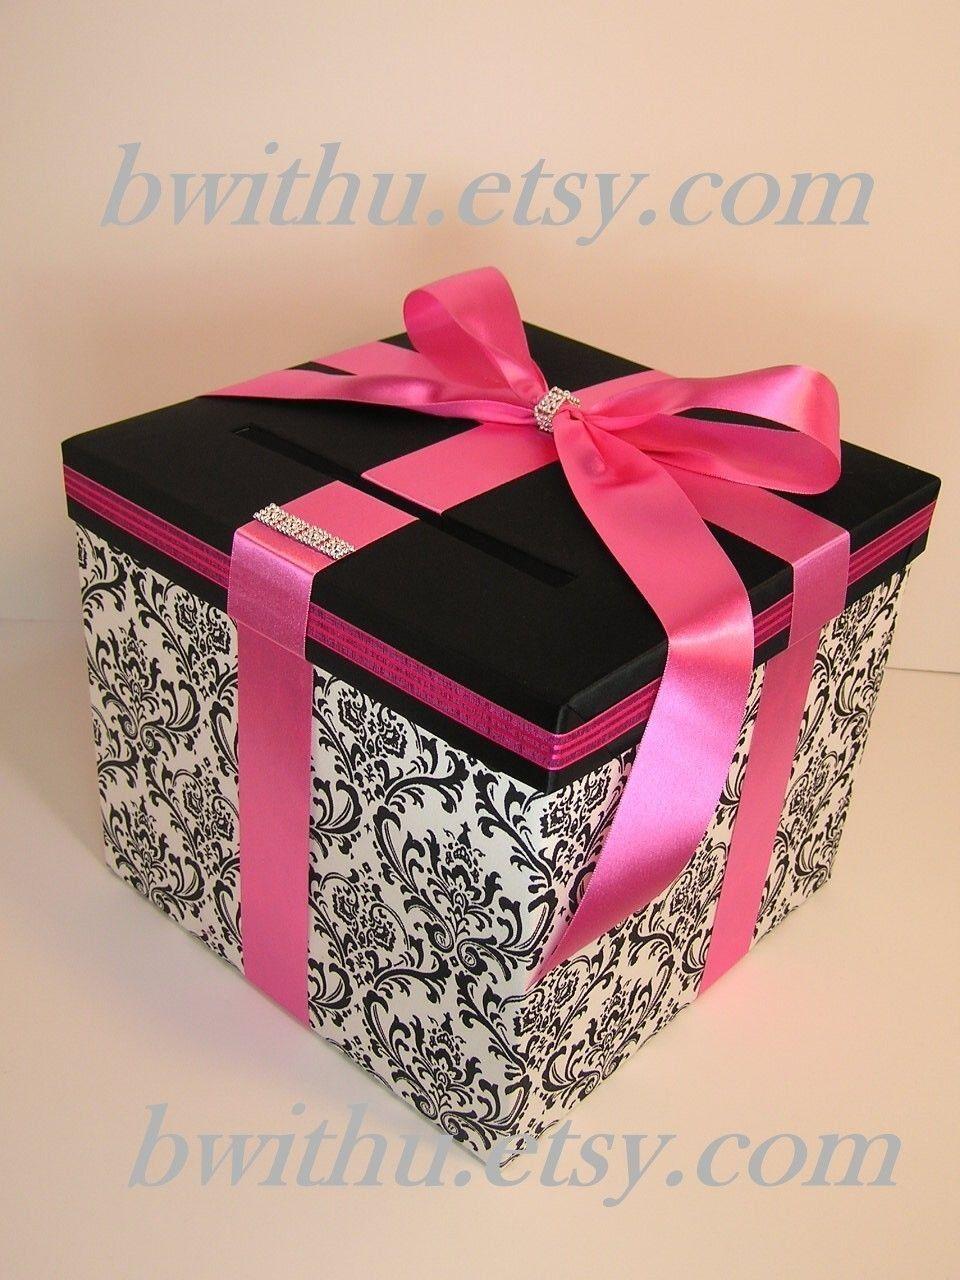 Damask Wedding Card Box Gift Card Box Money Card By Bwithustudio 62 00 Money Card Box Gift Card Boxes Card Box Wedding